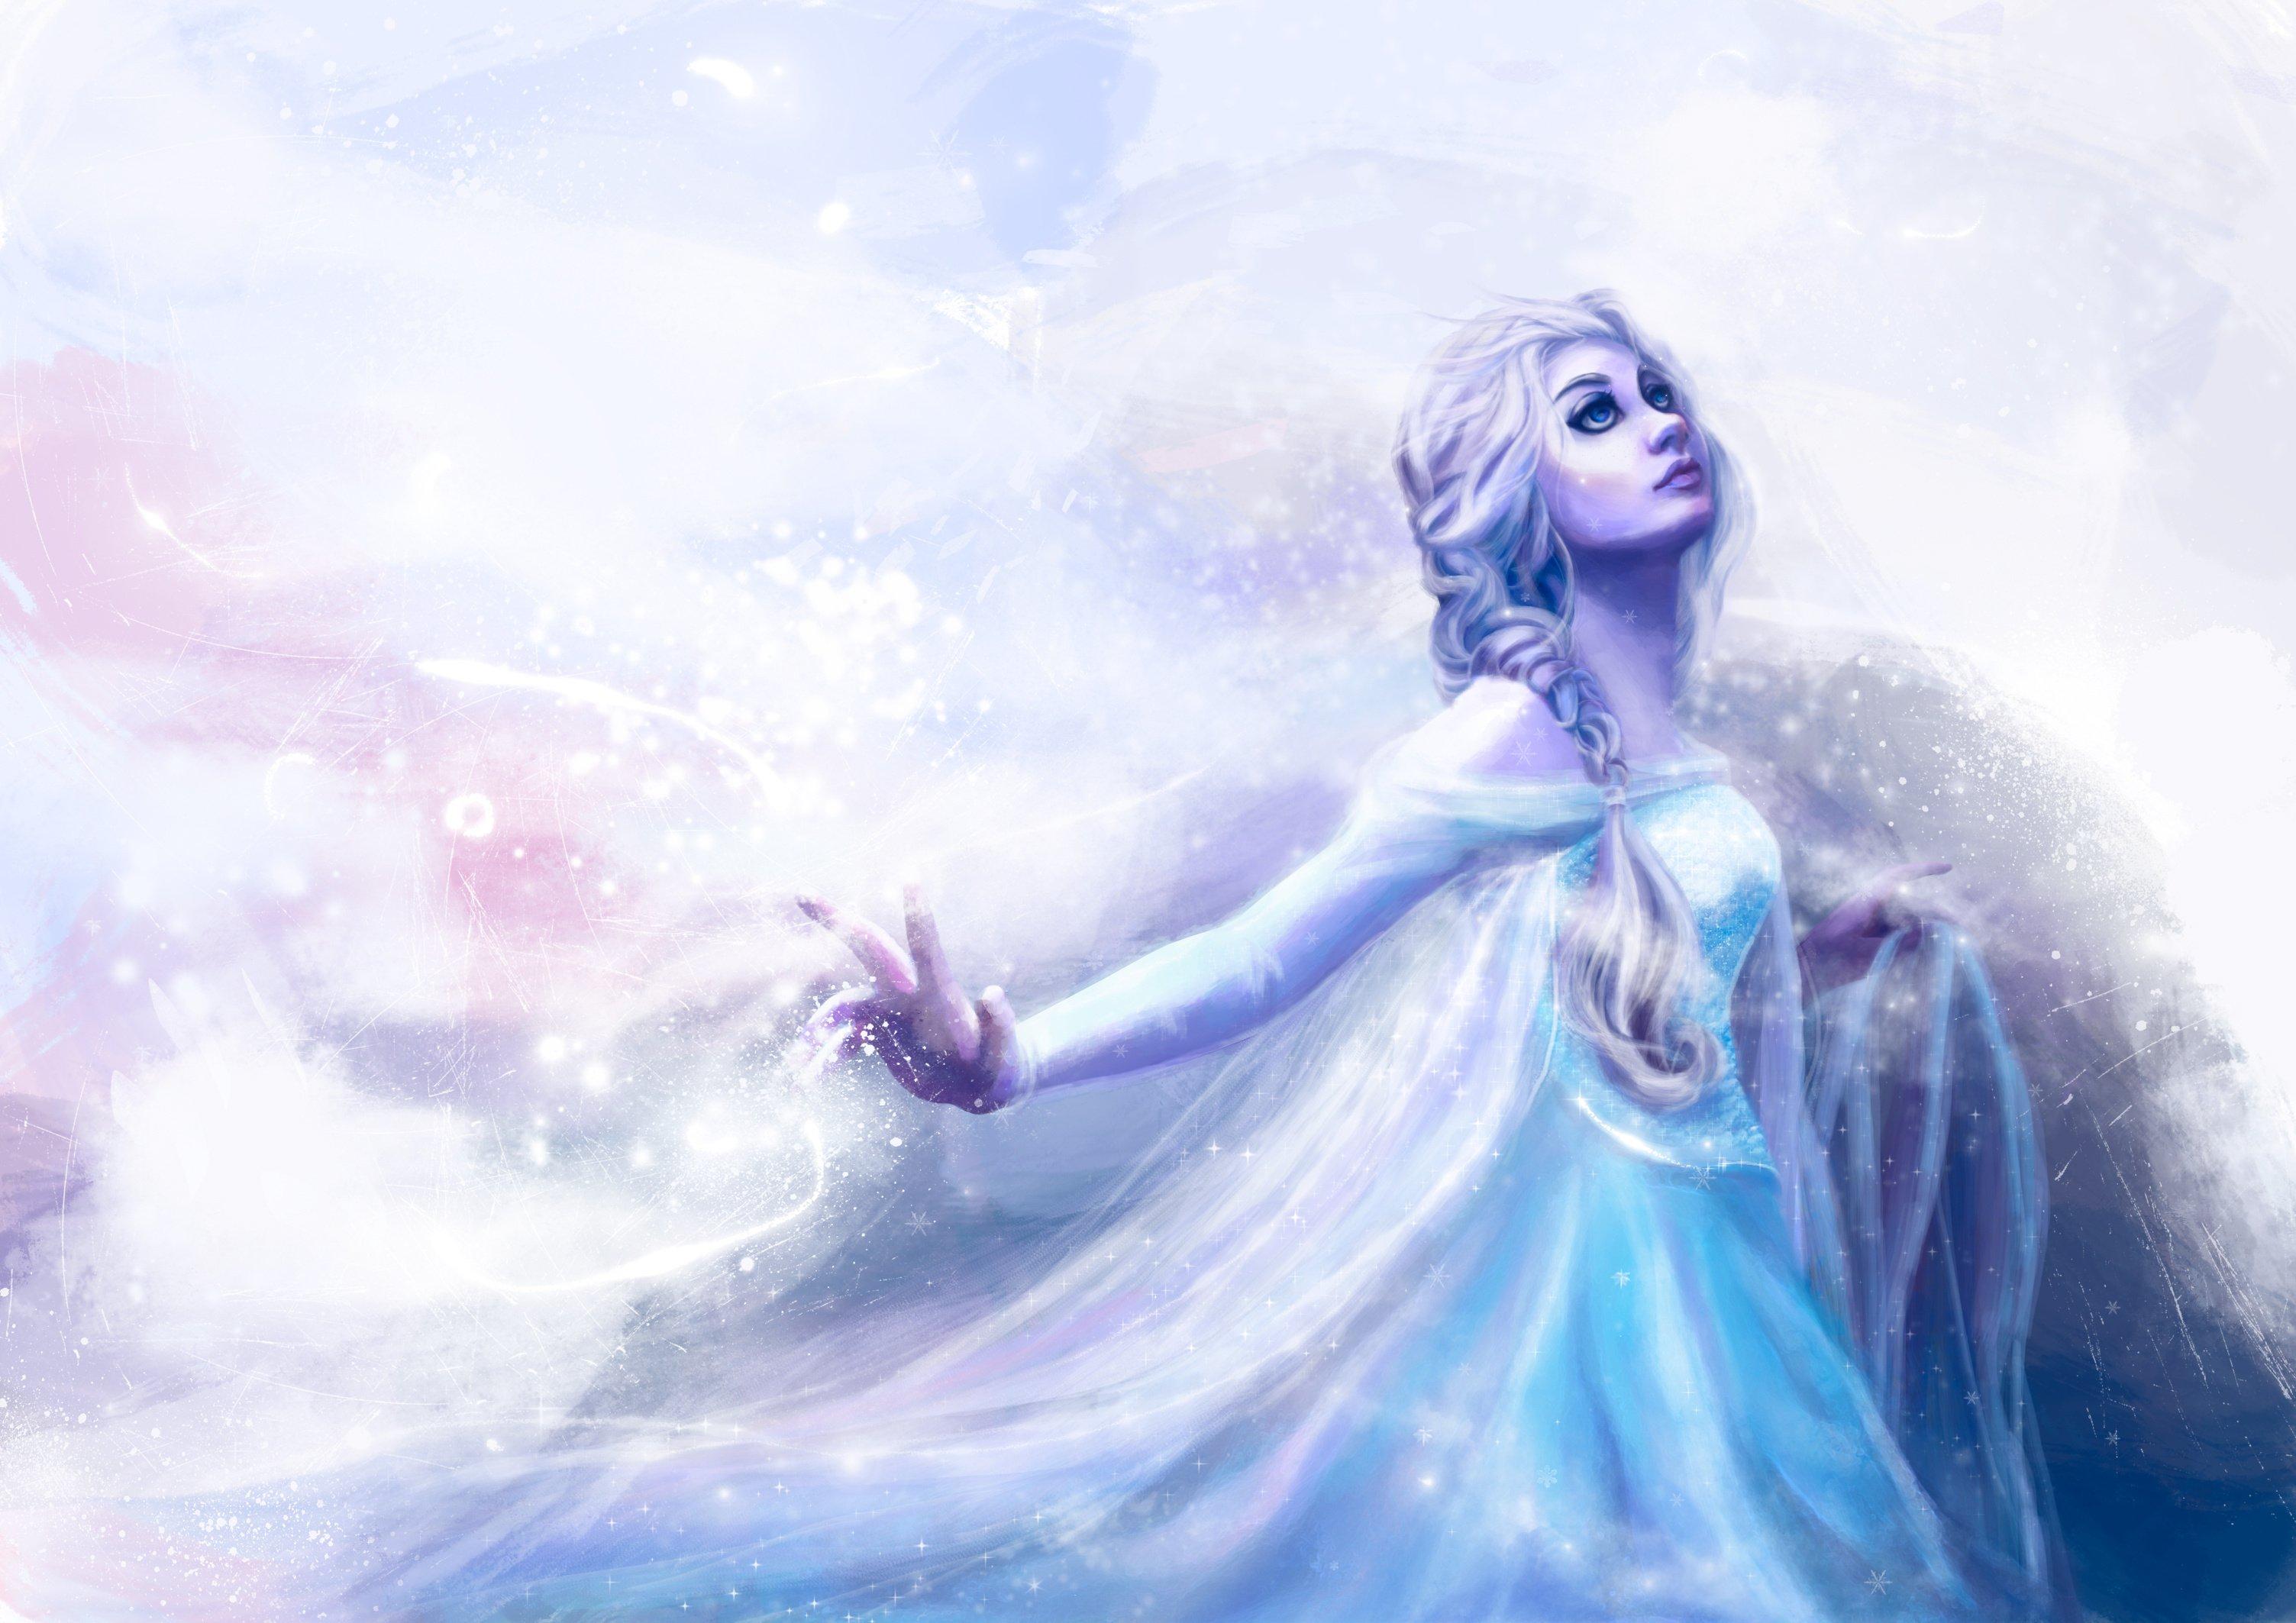 frozen snow queen elsa fantasy girl artwork mood wallpaper background 3007x2126